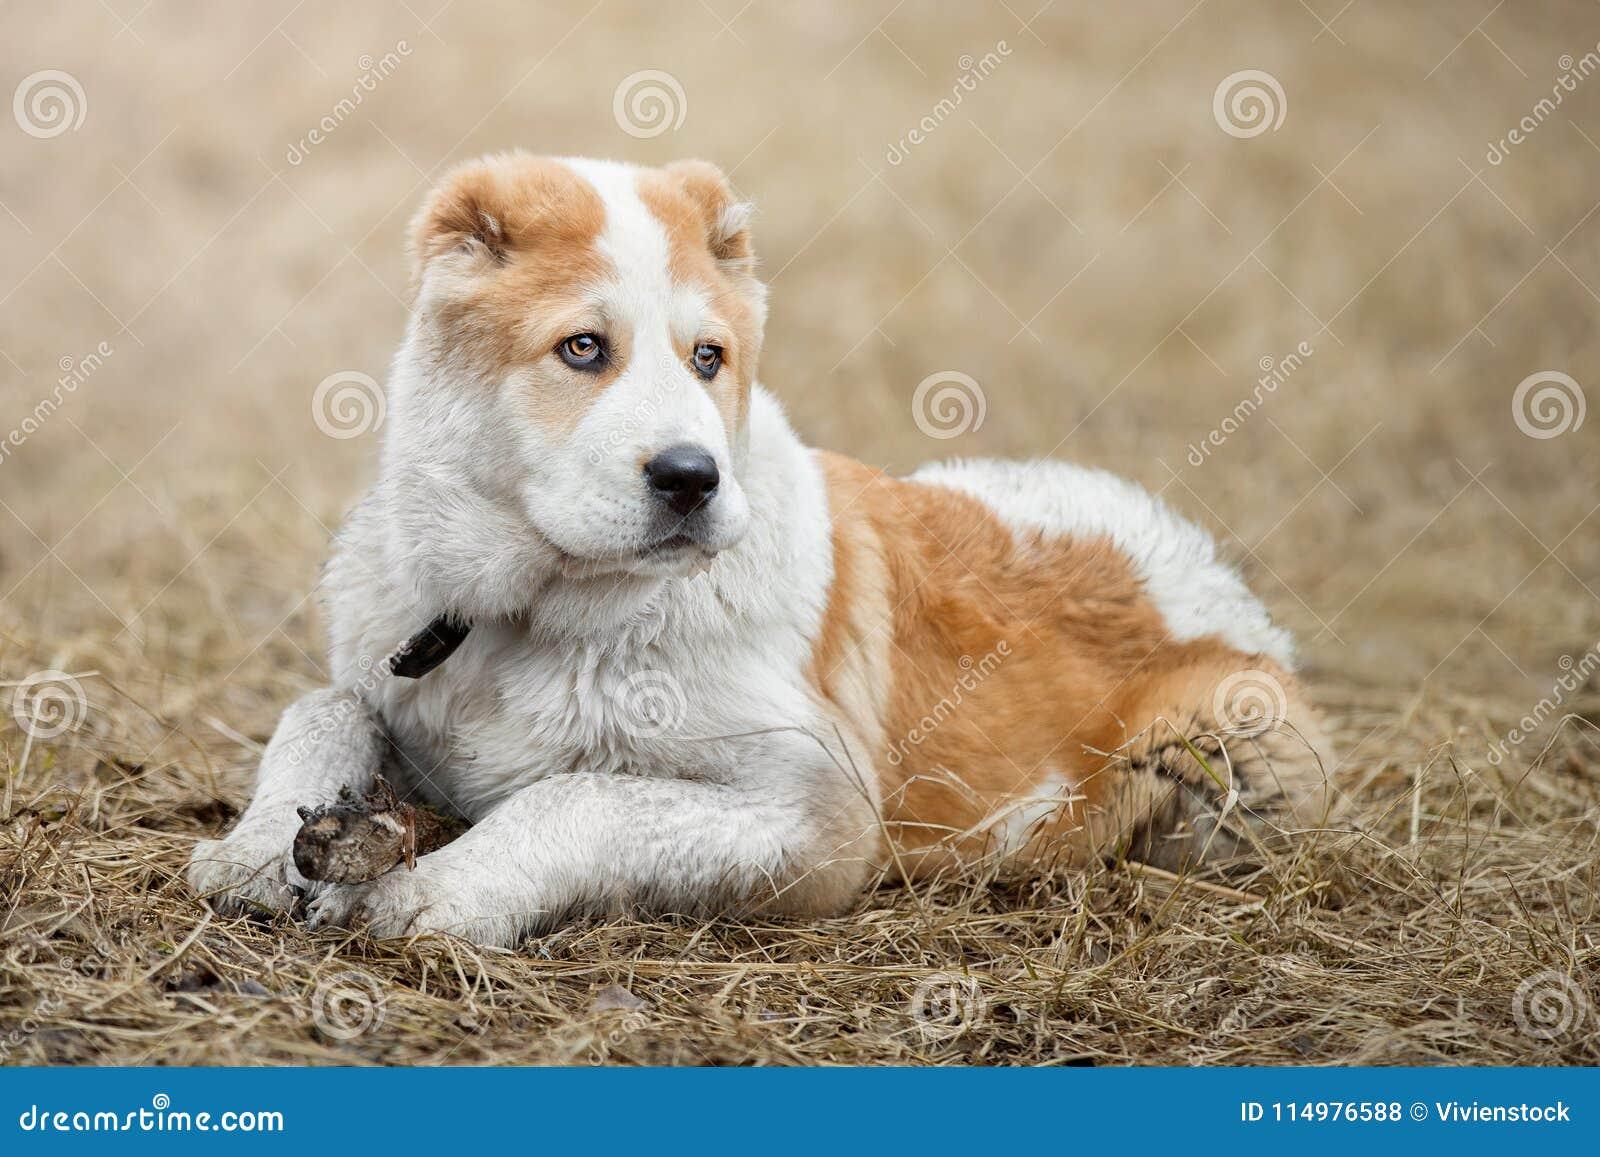 Alabai cute puppy alabai asian shepherd stock photo - image of portrait